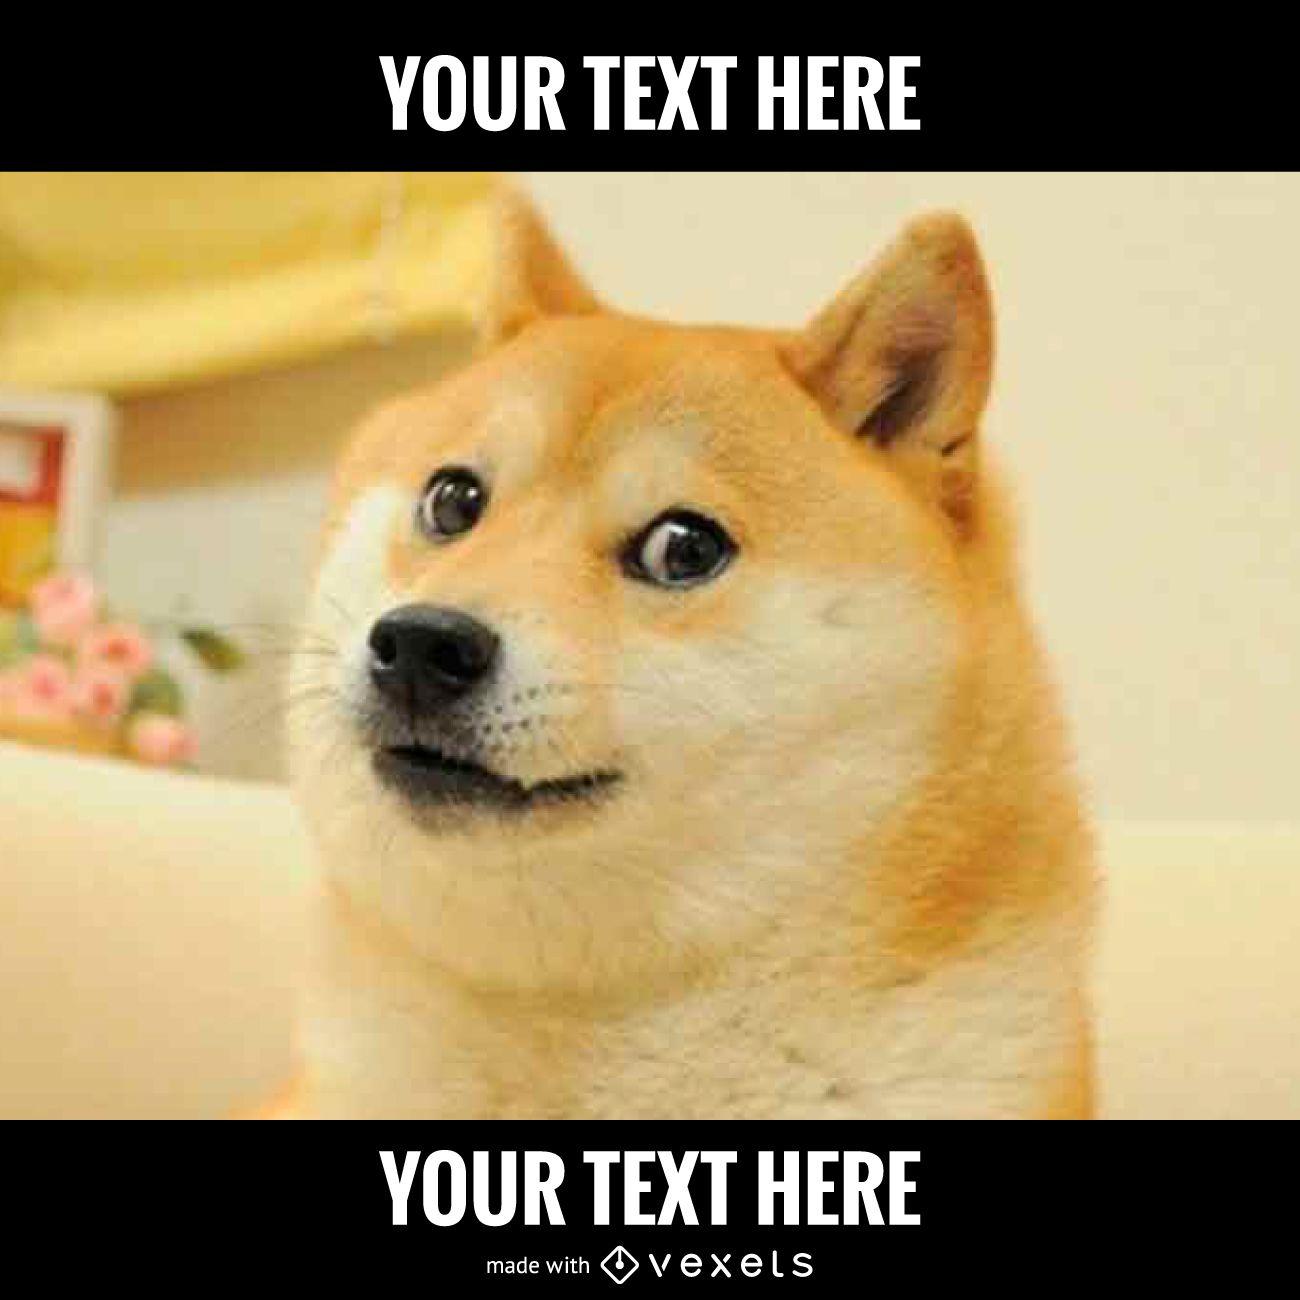 Generador de memes de perros